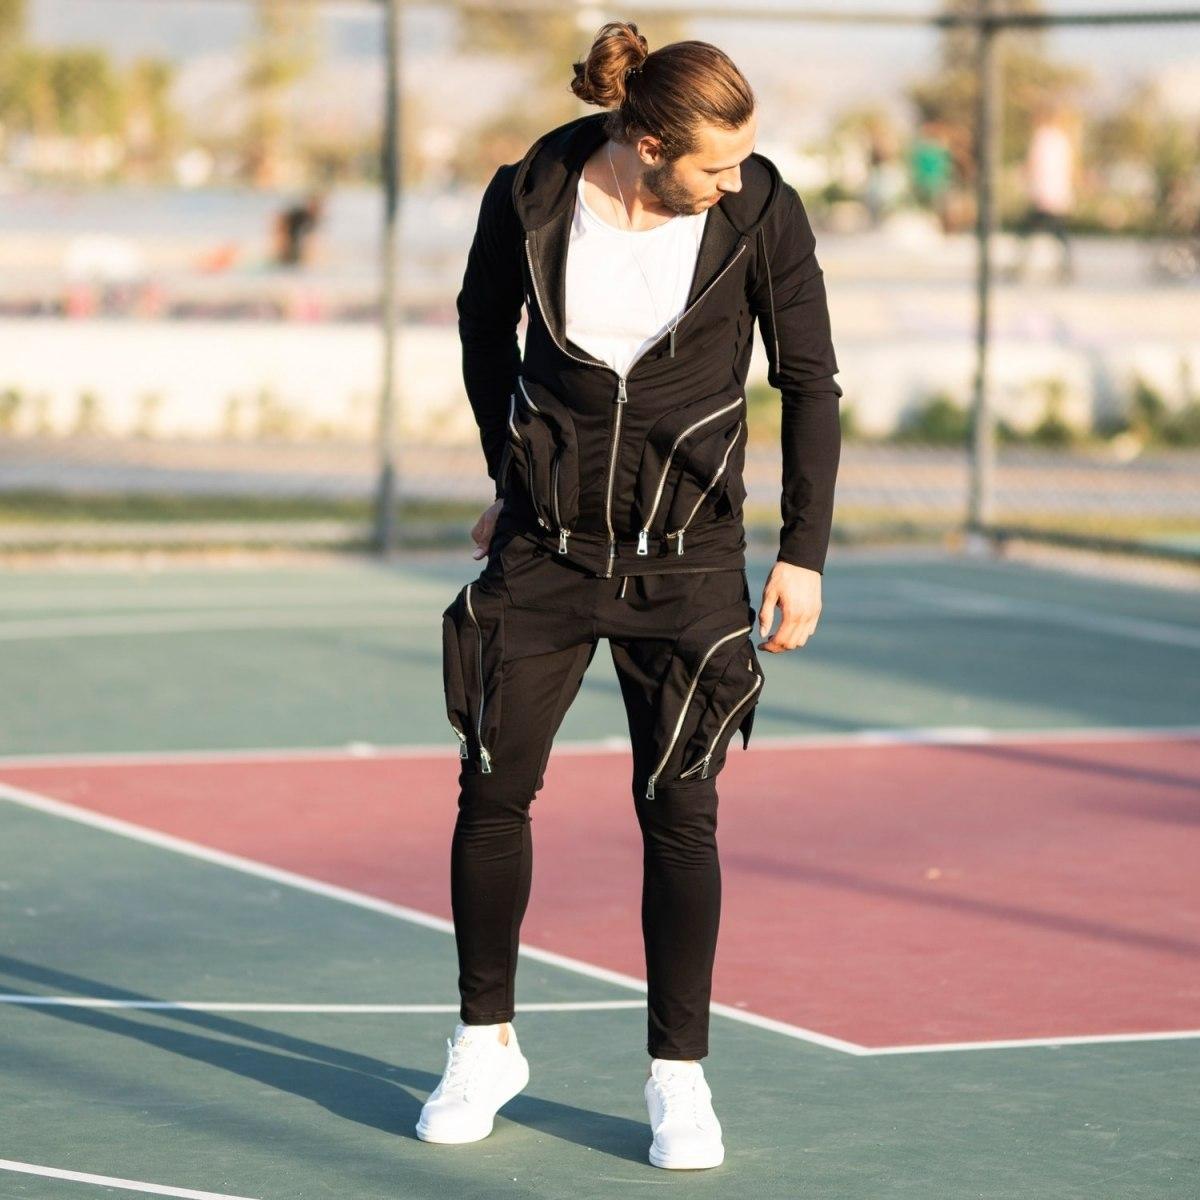 Men's Black Zipped Sweatsuit Mv Premium Brand - 1